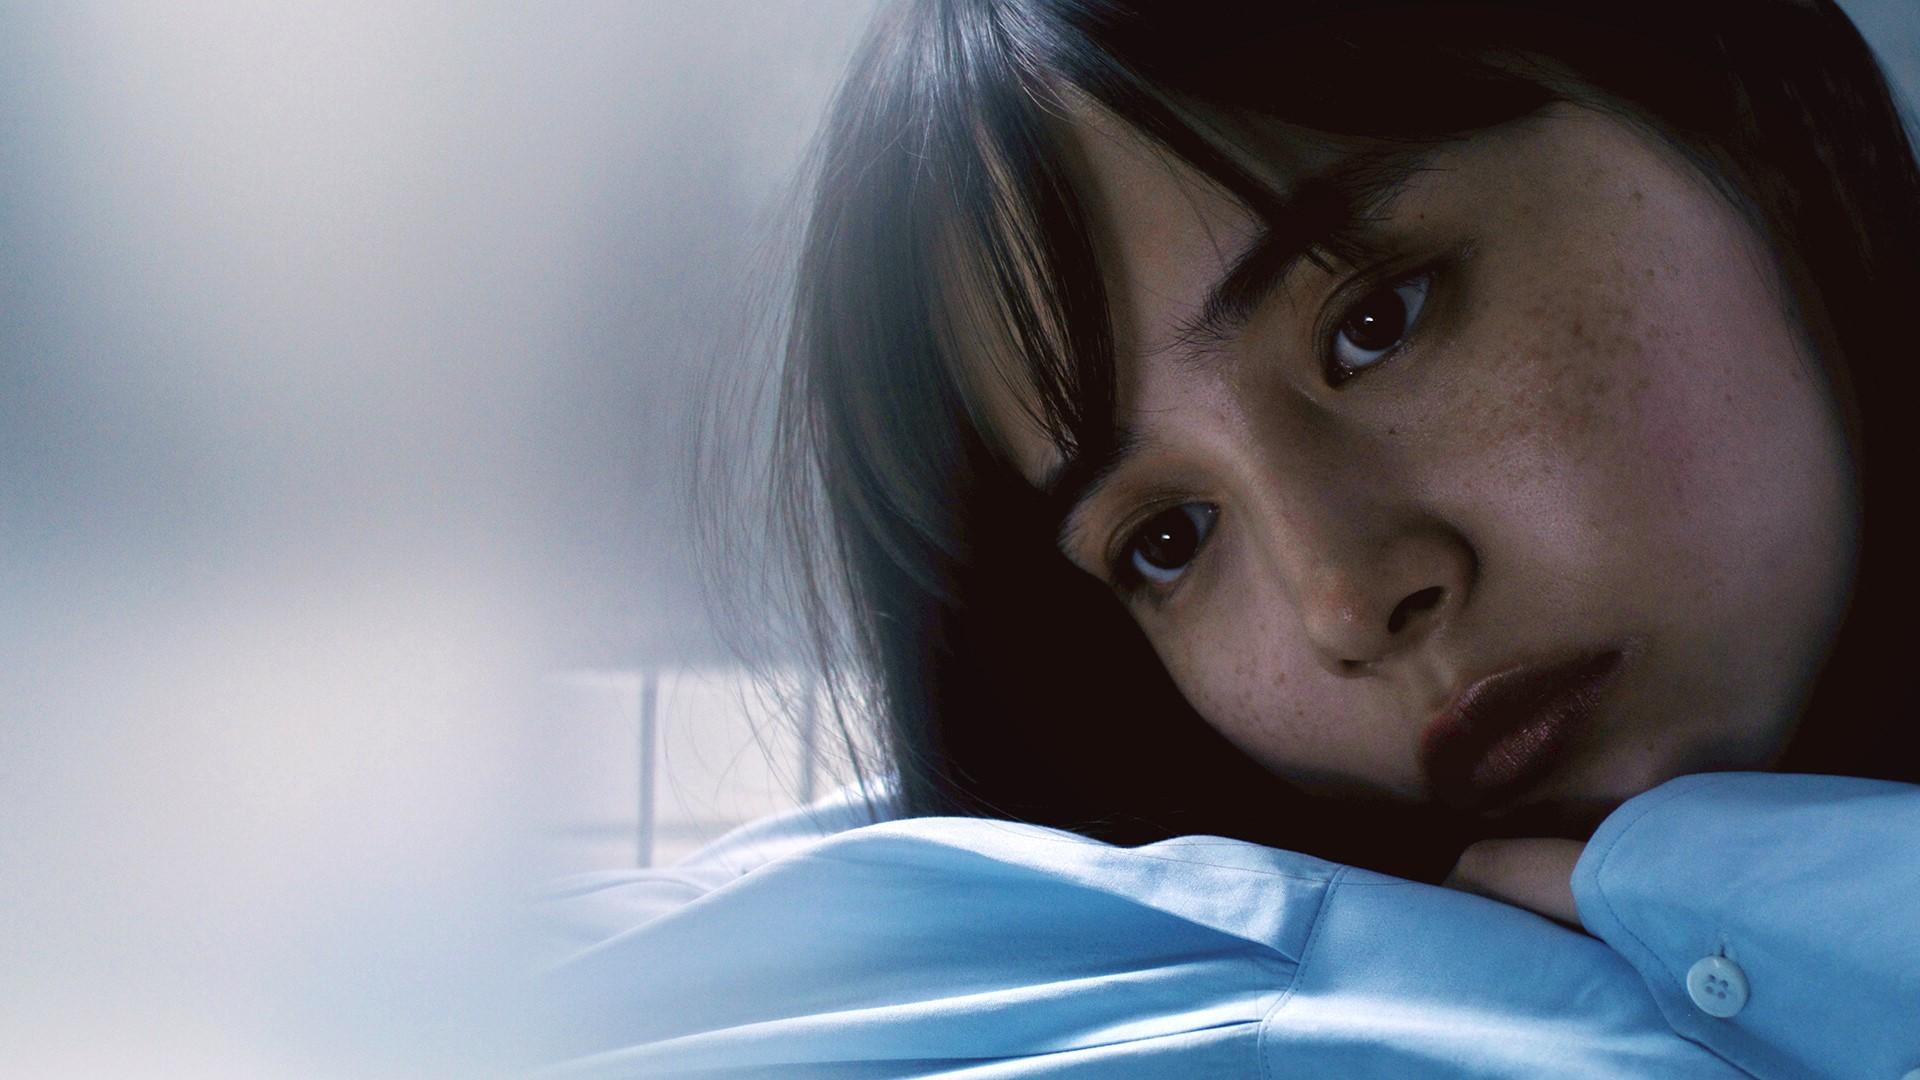 「BLUE feat. kojikoji」MVサムネイル